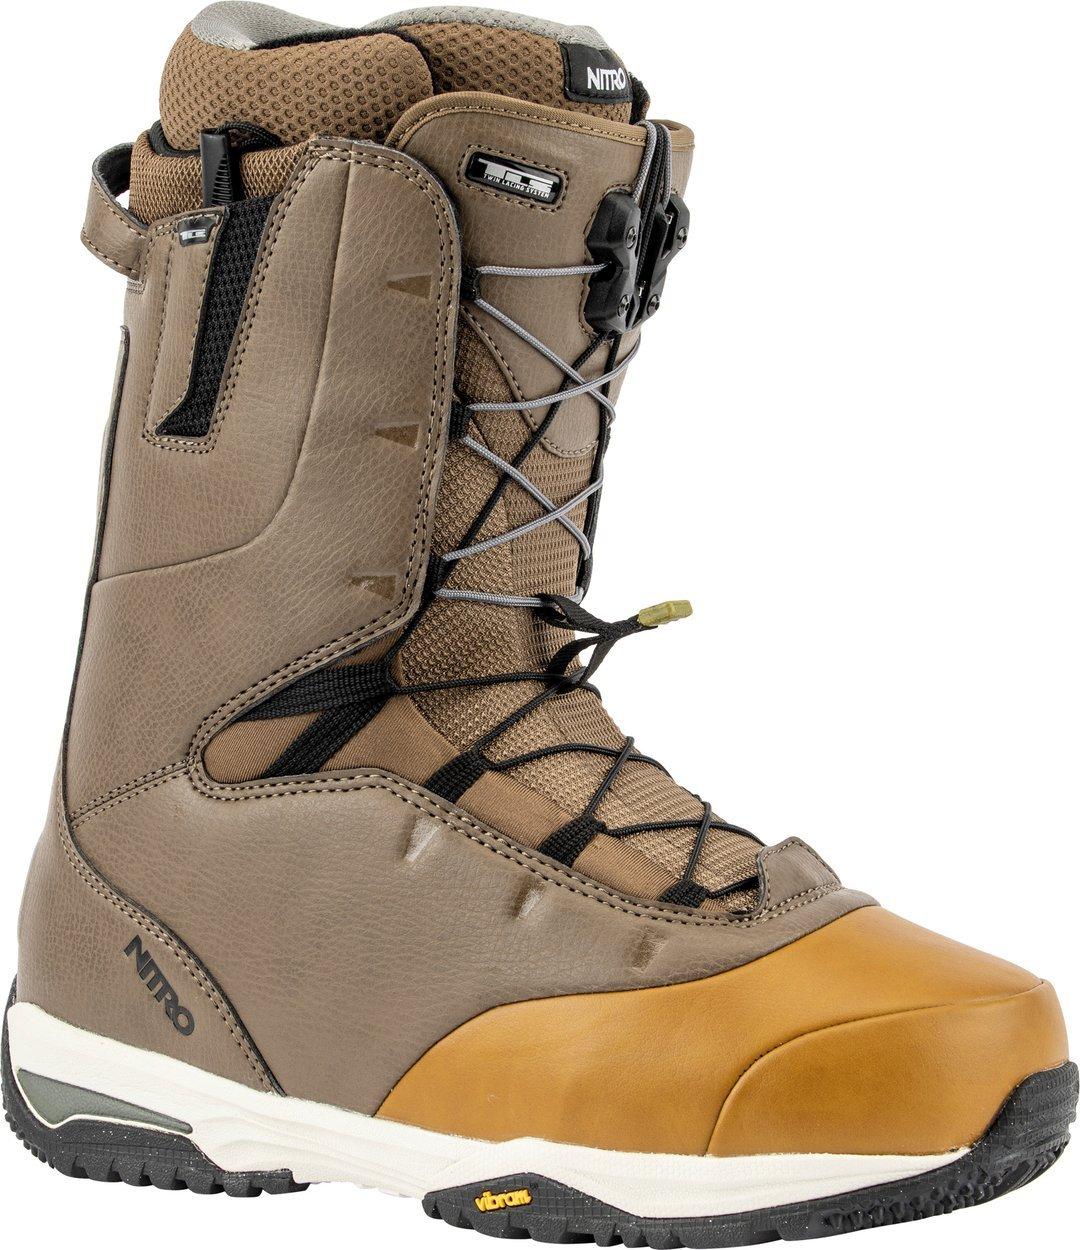 Nitro Venture Pro Tls Boots Two Tone Brown 2020